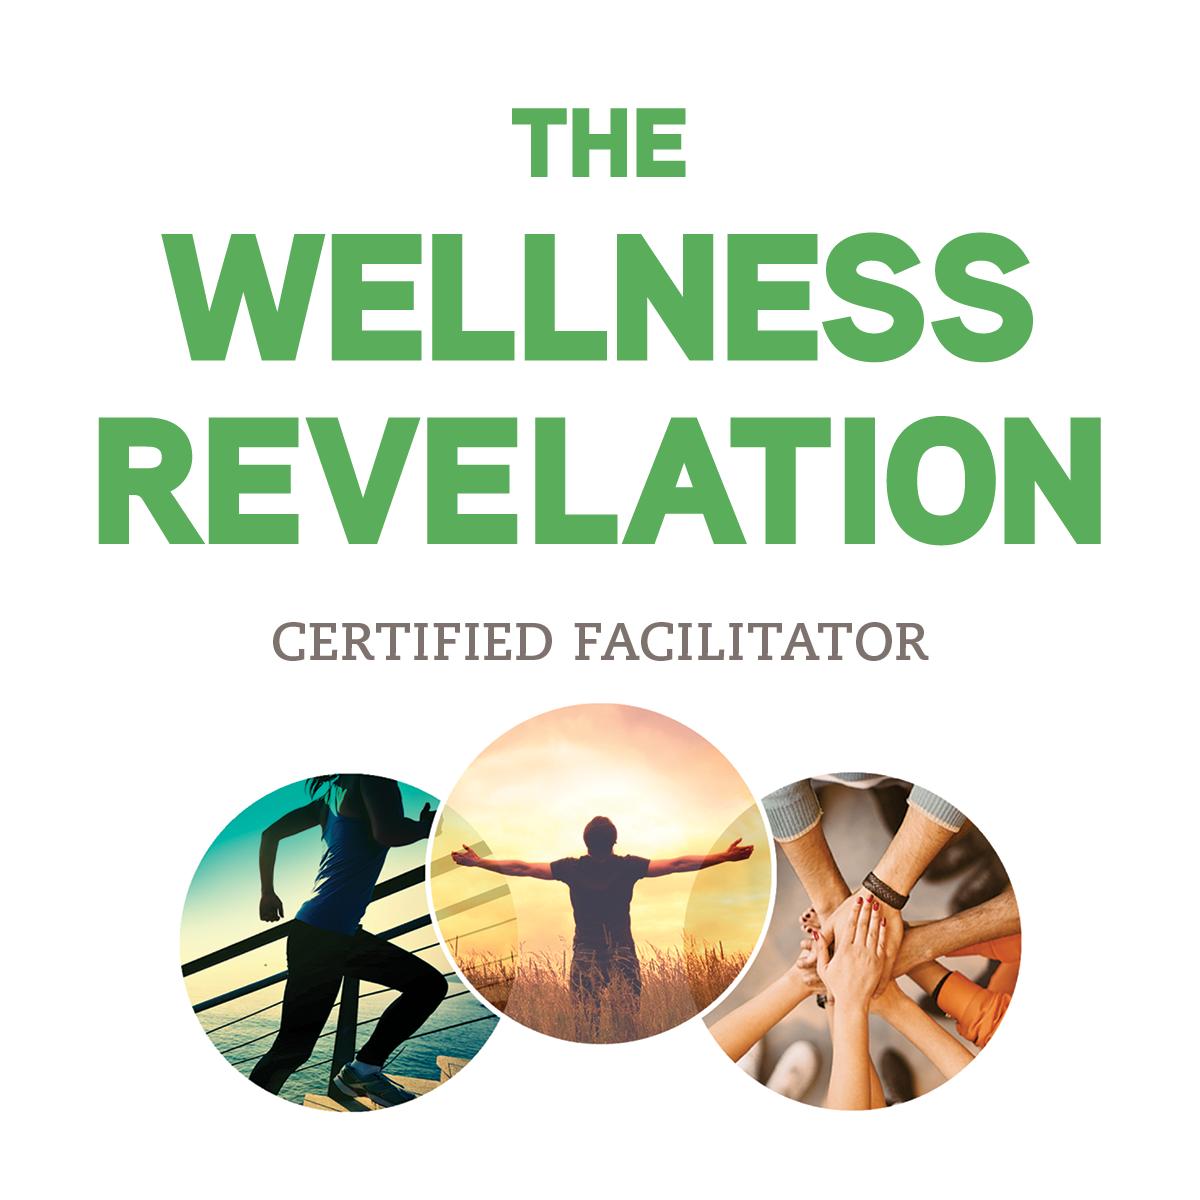 The Wellness Revelation Online Study